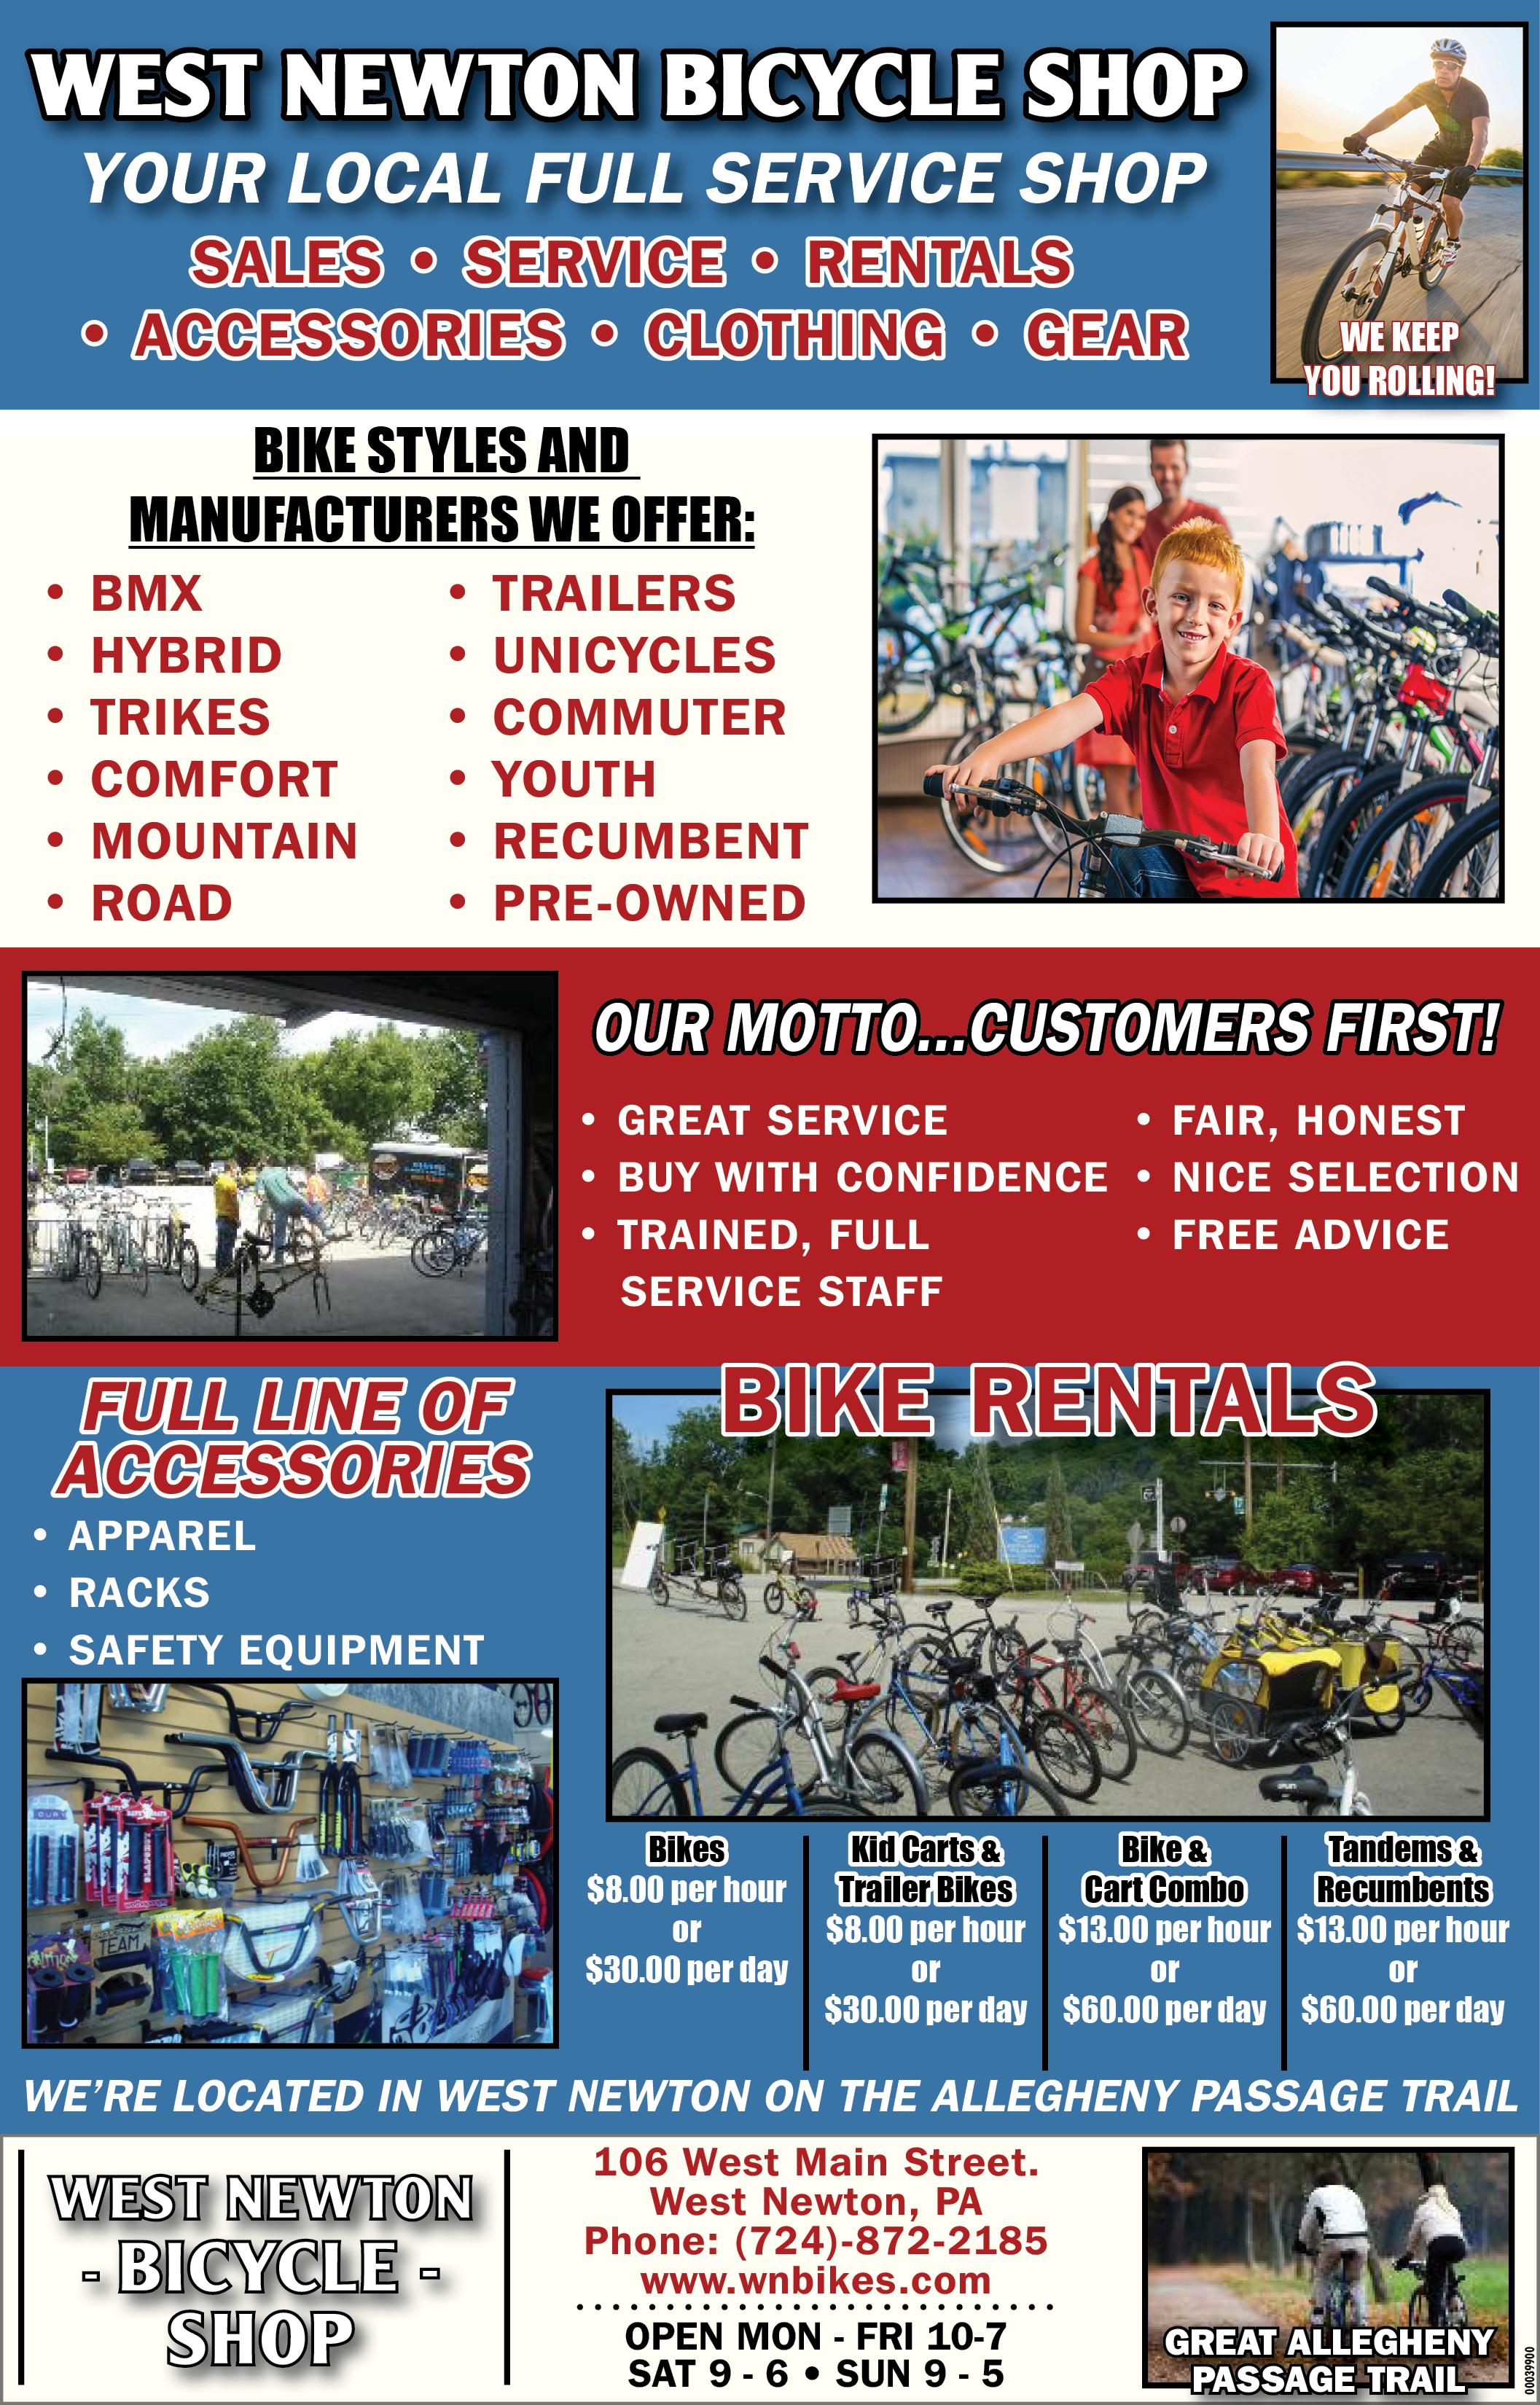 00039900_WN Bike Shop_4x11